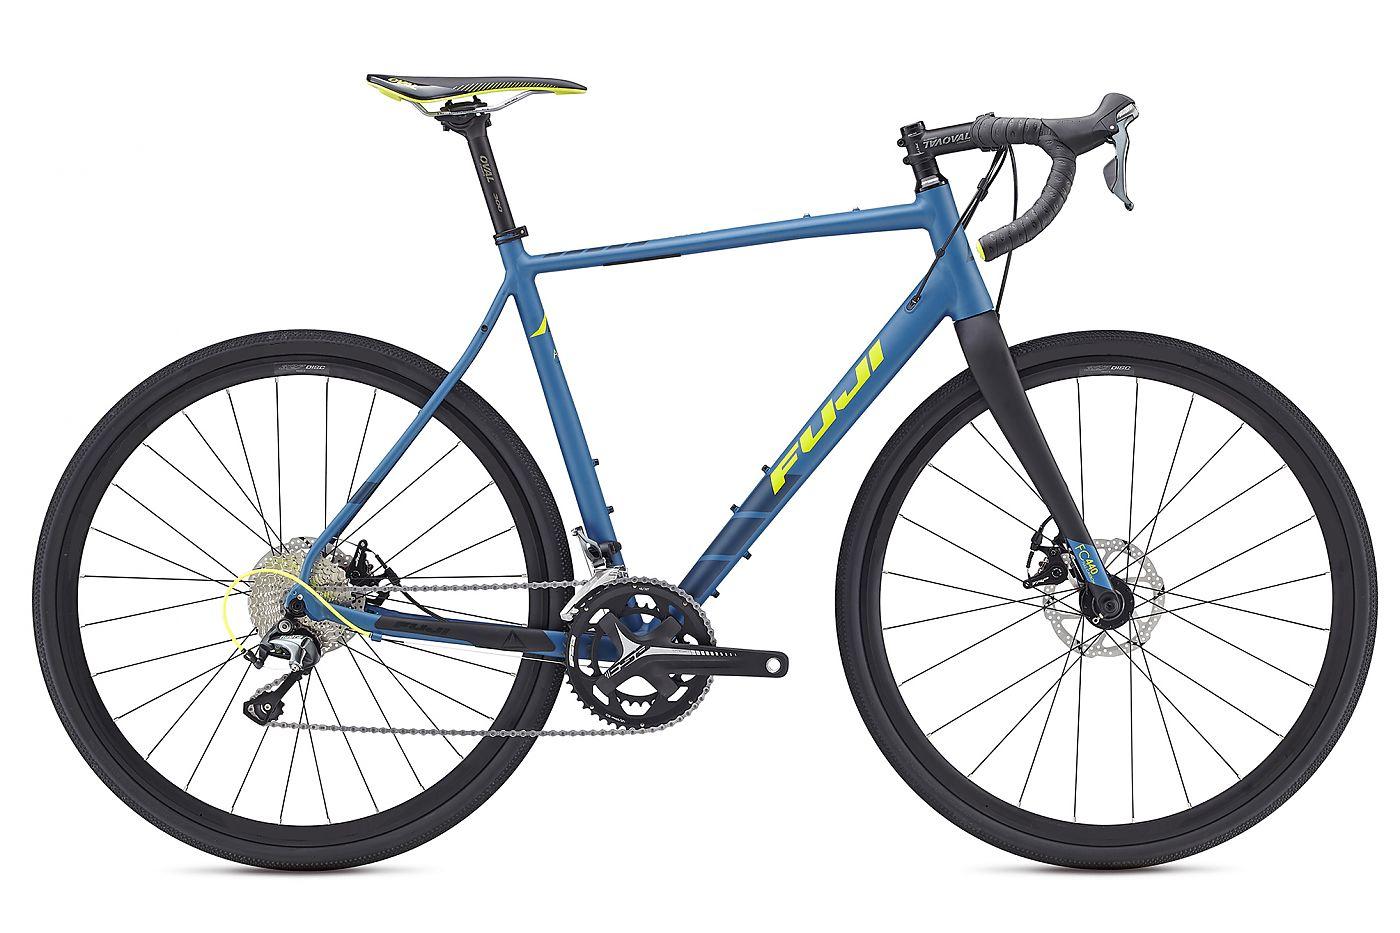 Fuji Introduces New Offroad Touring Bike The Jari